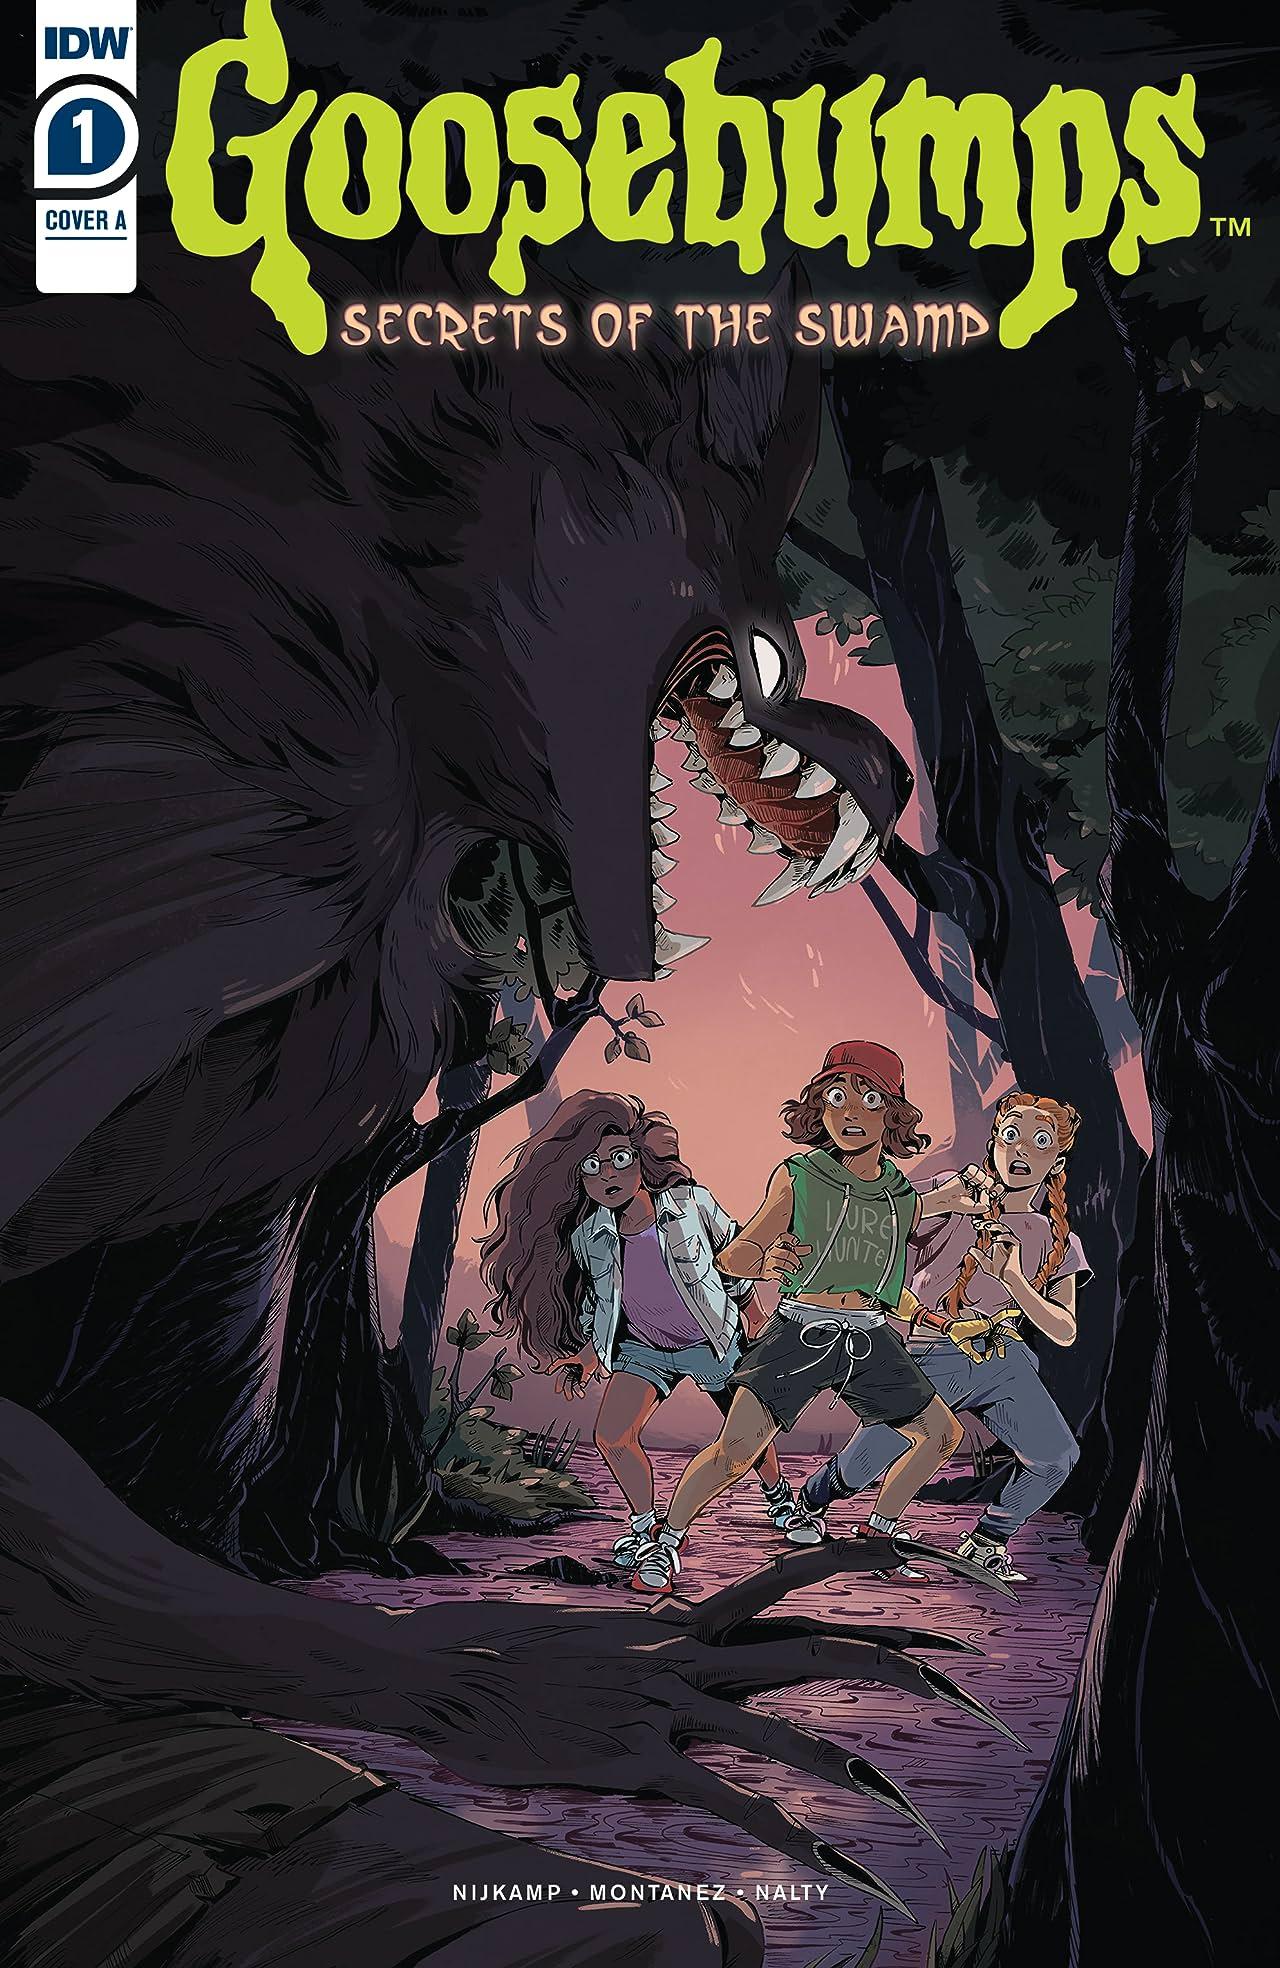 Goosebumps: Secrets of the Swamp #1 (of 5)